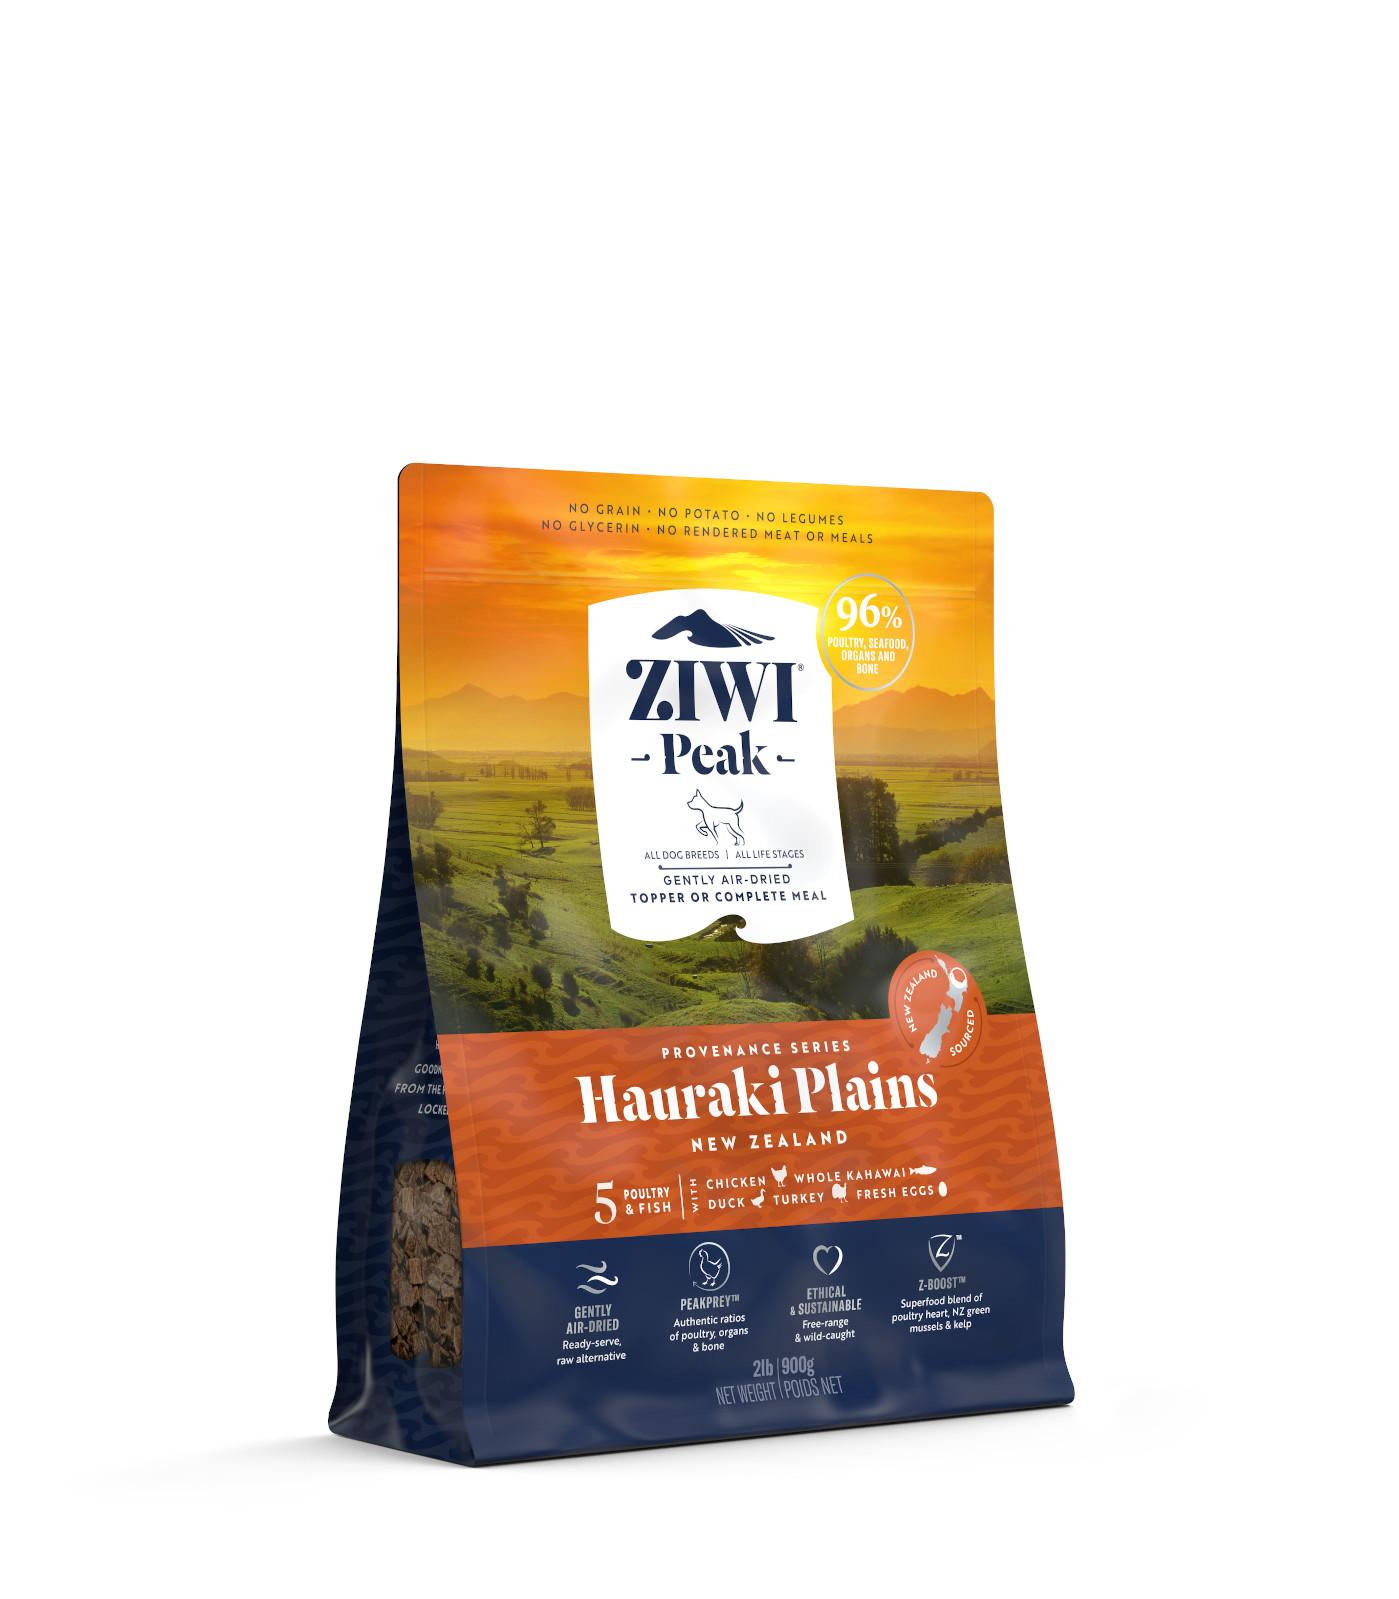 ZIWI Peak Provenance Air-Dried Dog Food Hauraki Plains Recipe, 2-lb